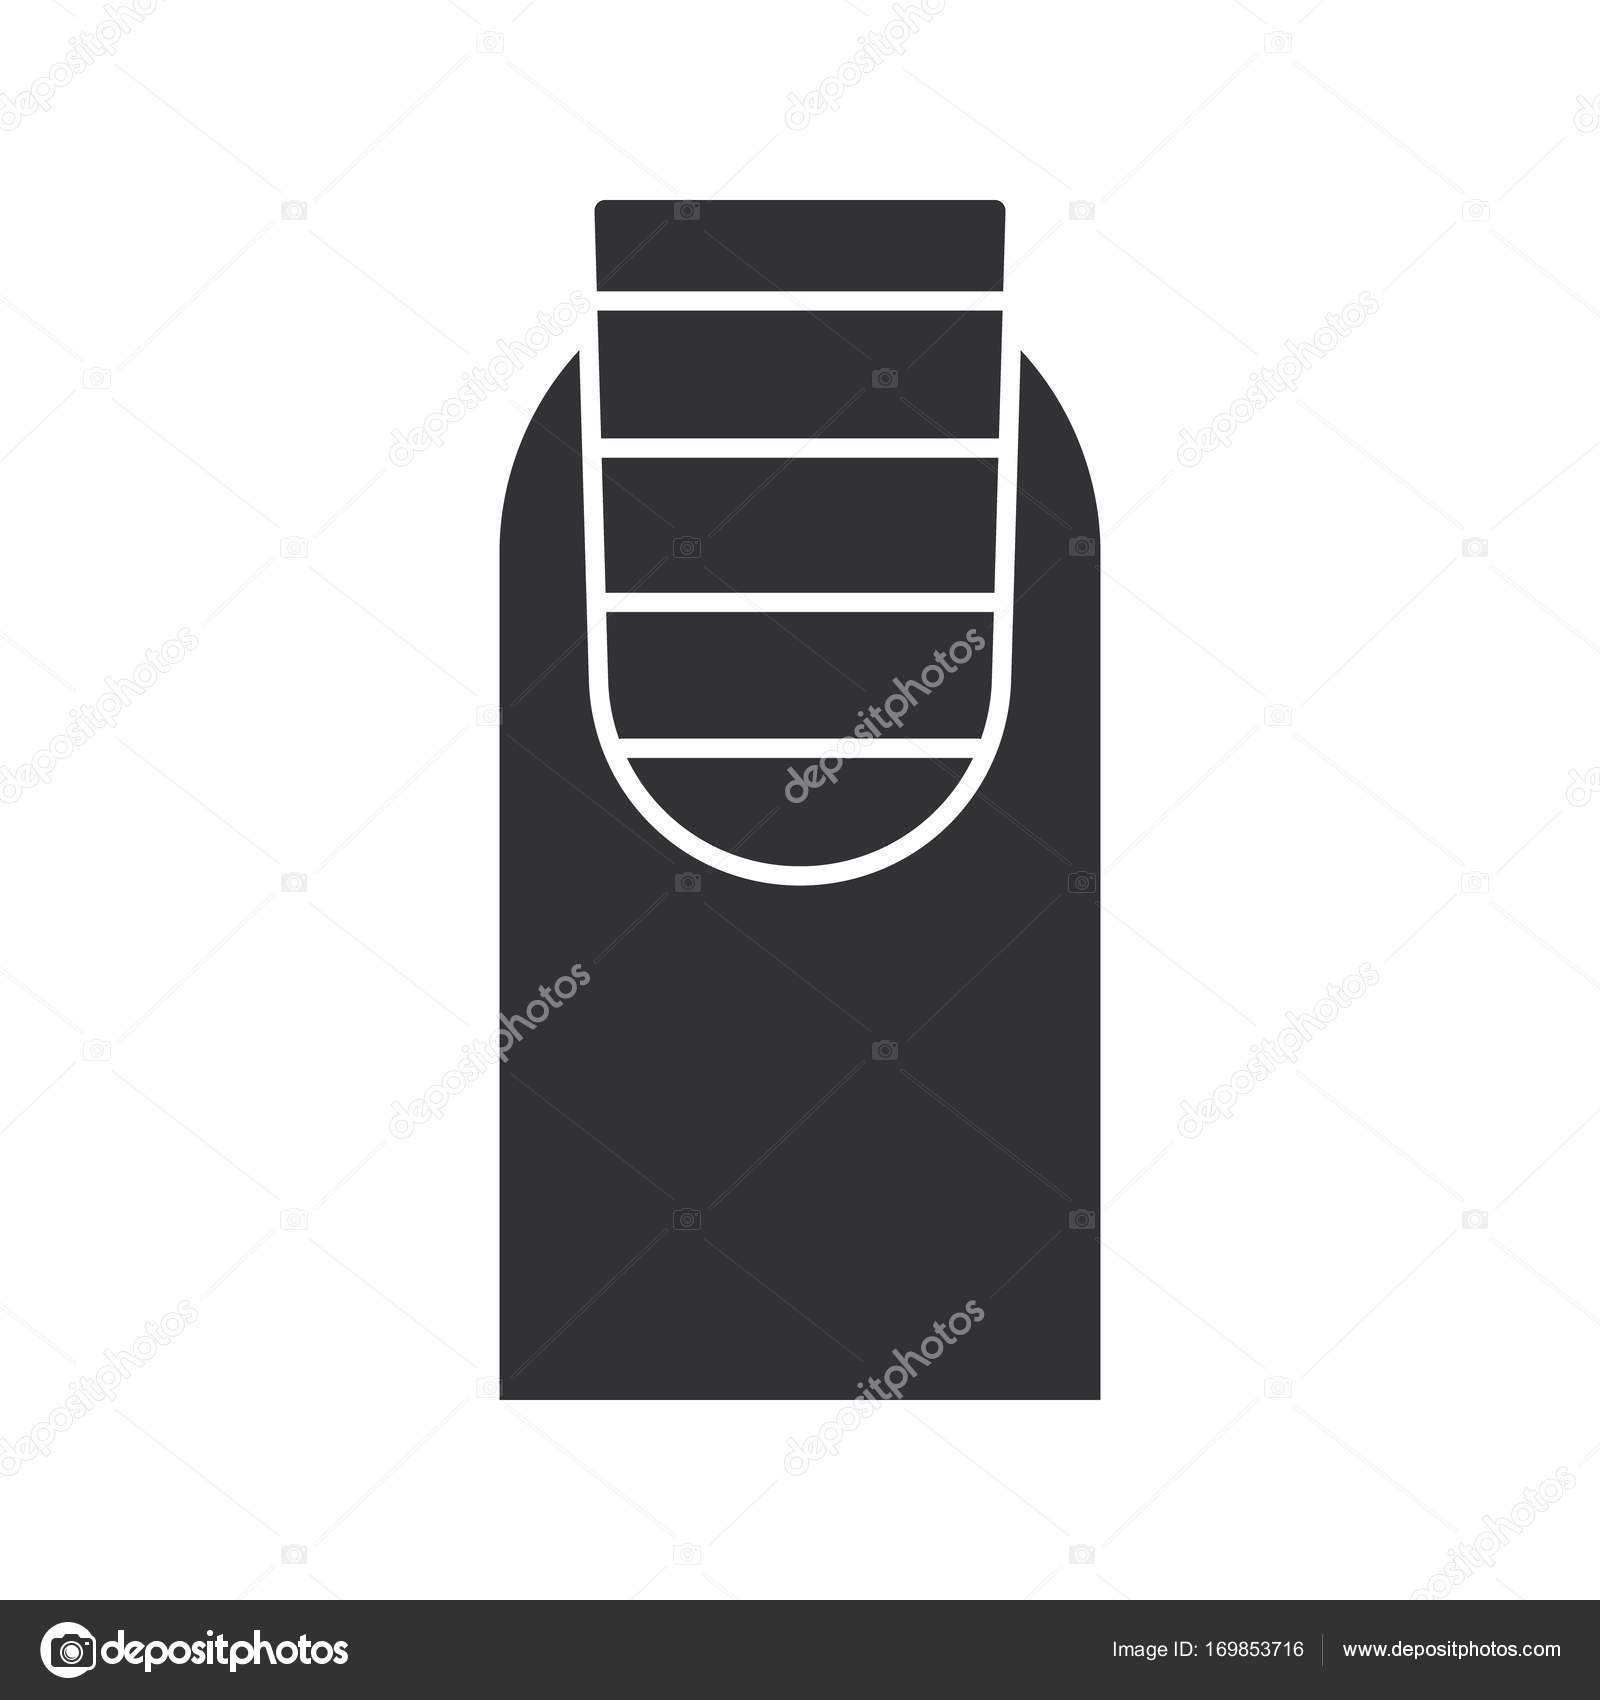 Gestreifte Nagel-Kunst-Design-Ikone — Stockvektor © bsd #169853716